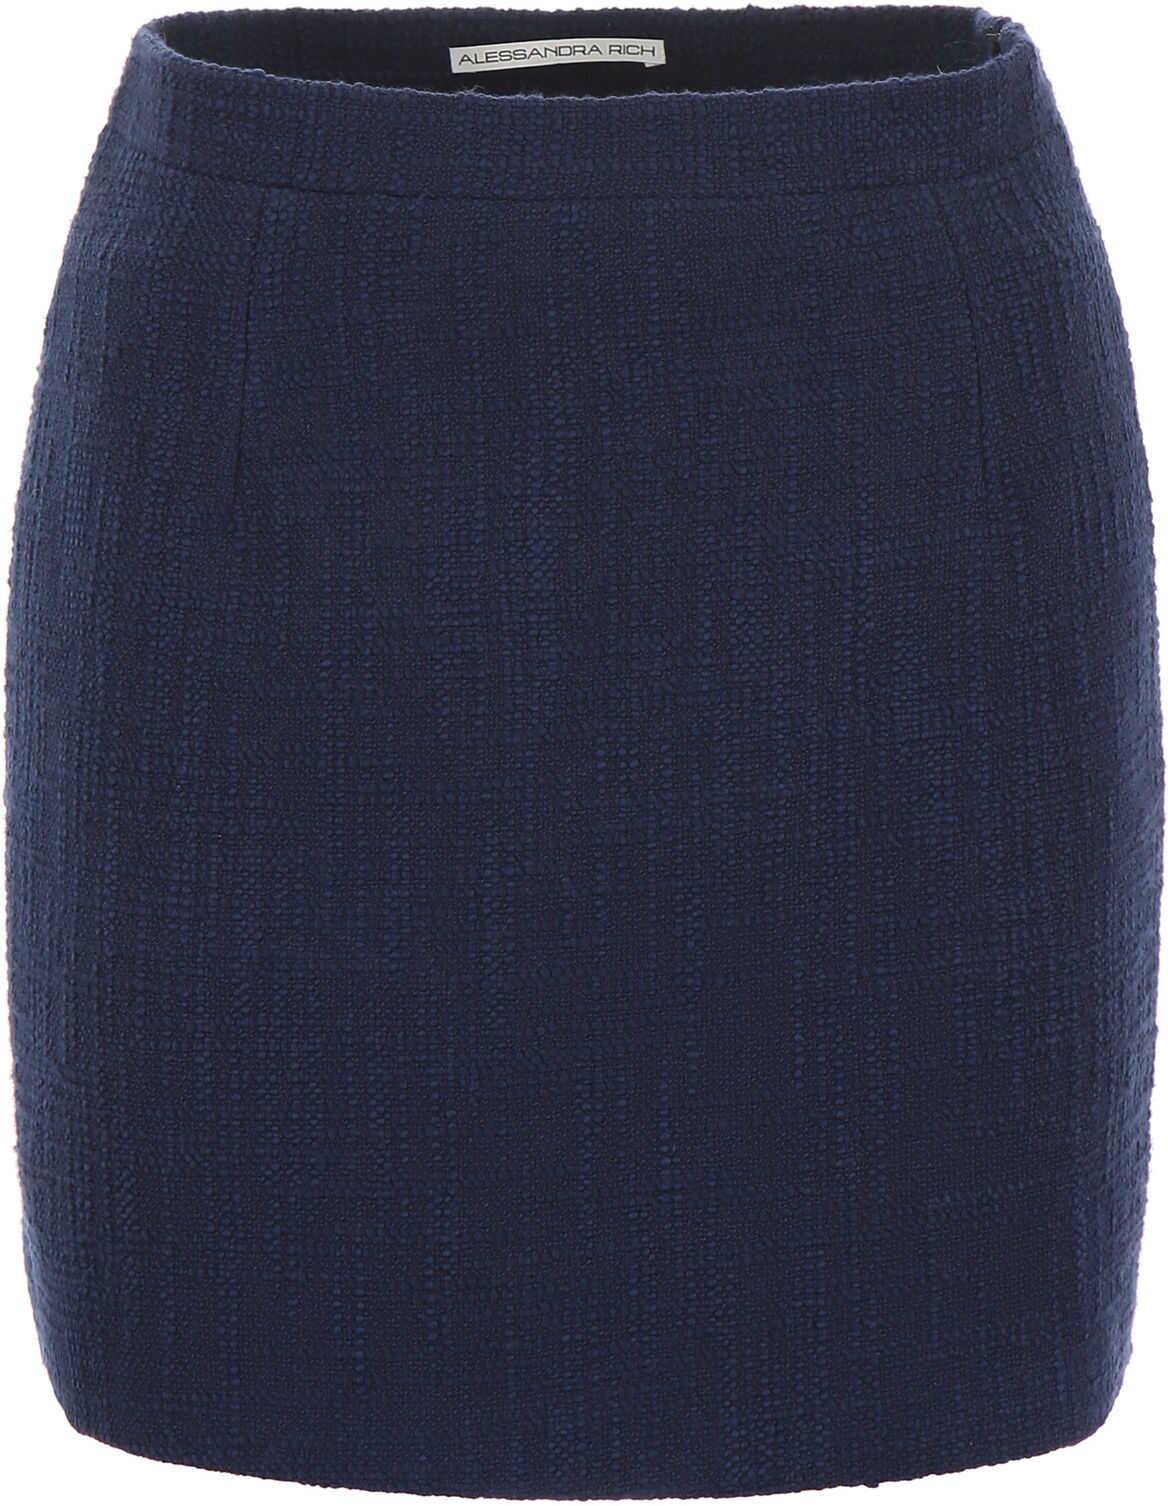 Alessandra Rich Tweed Skirt BLUE